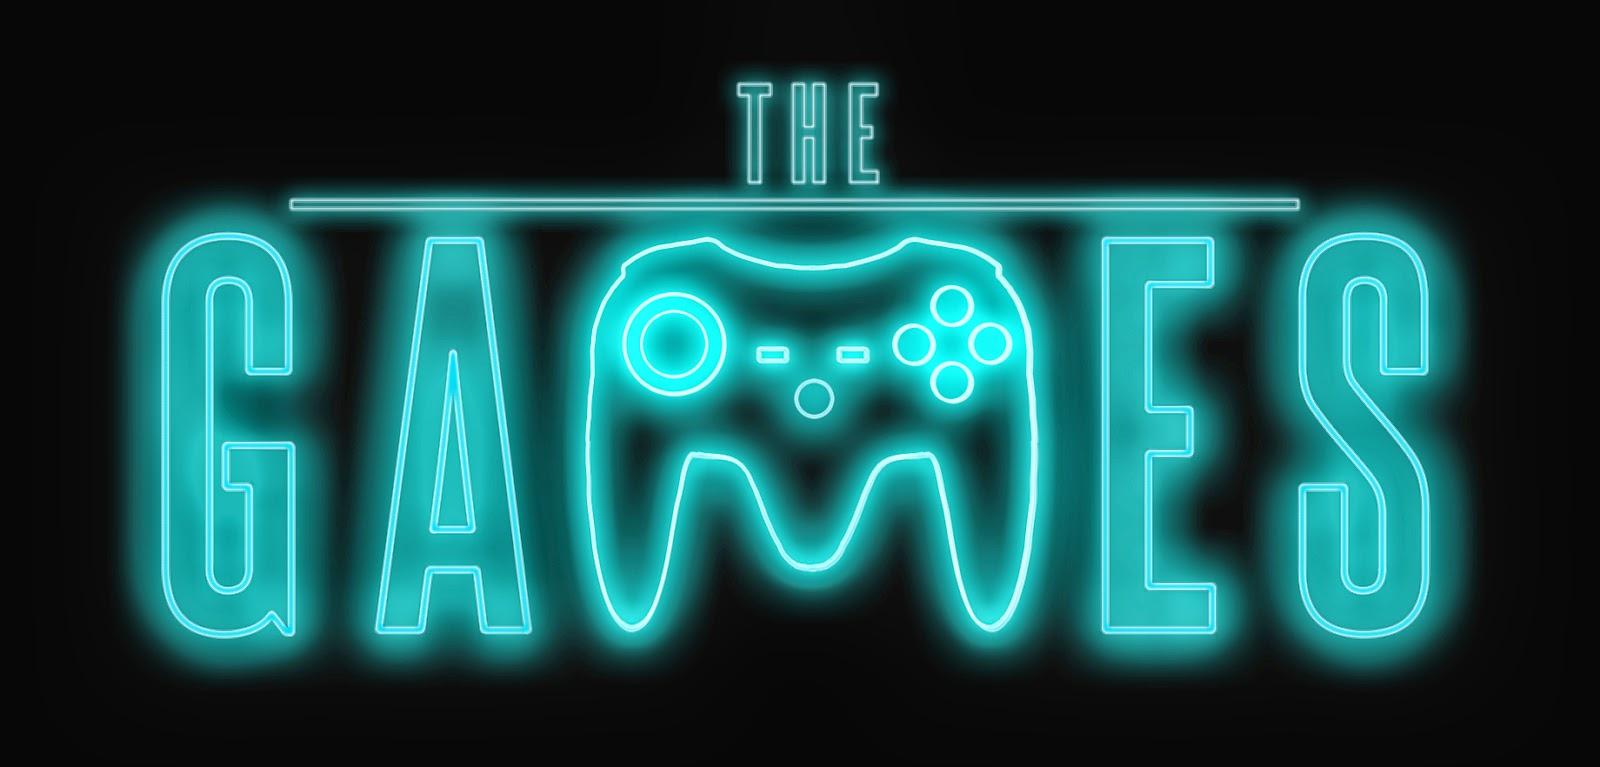 allah-beni-boyle-yaratmis-game-thegame-play-oyun-oynamak-games